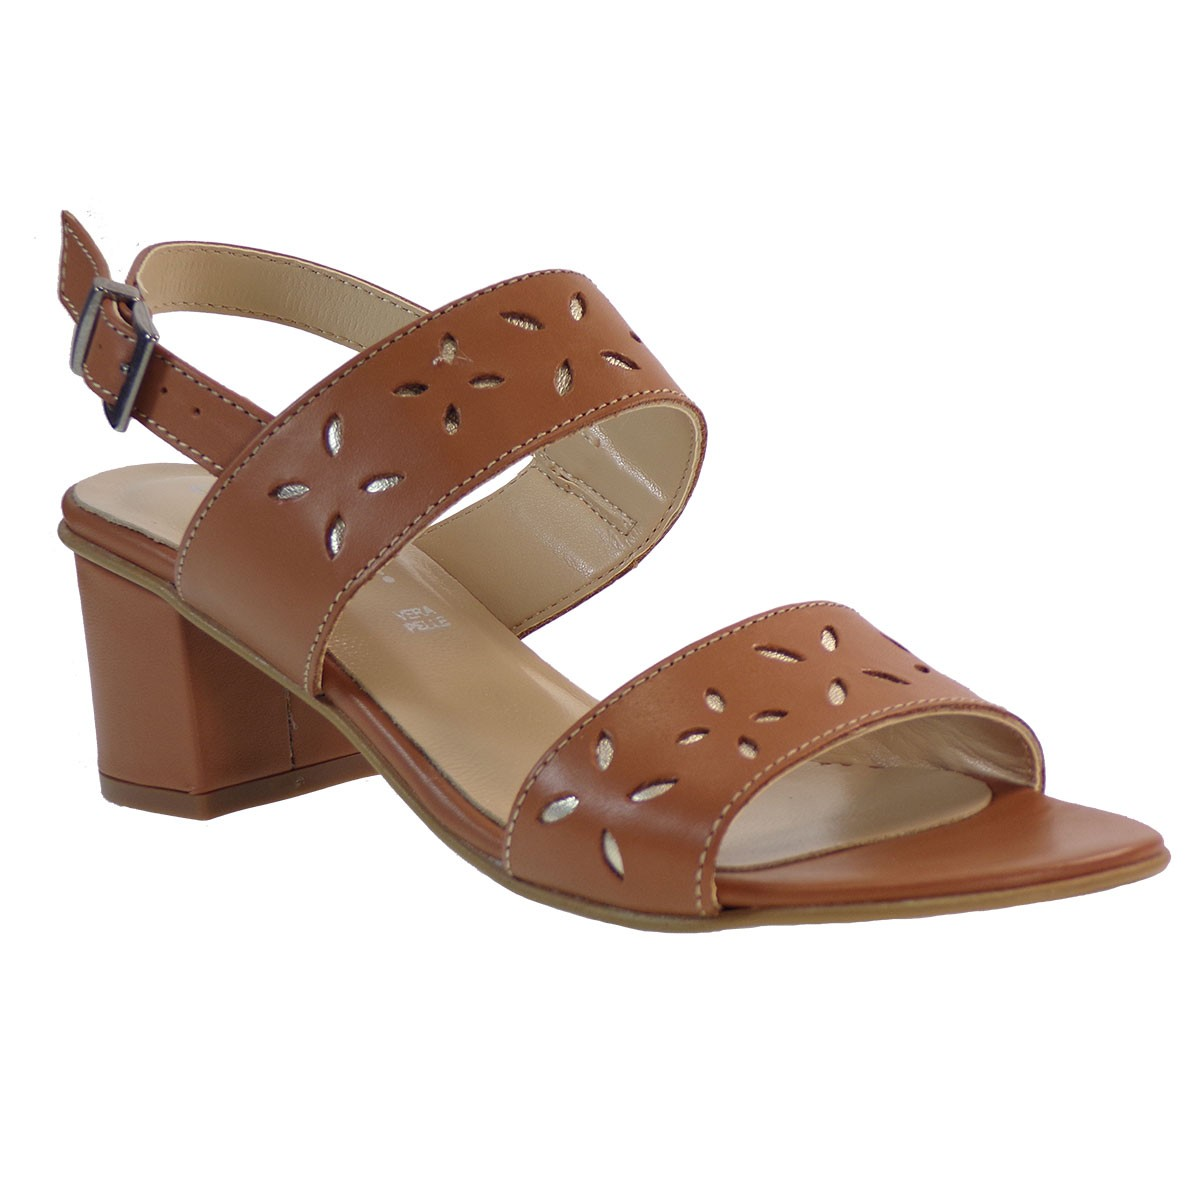 Cornelius Shoes Γυναικεία Πέδιλα 31-174 Ταμπά